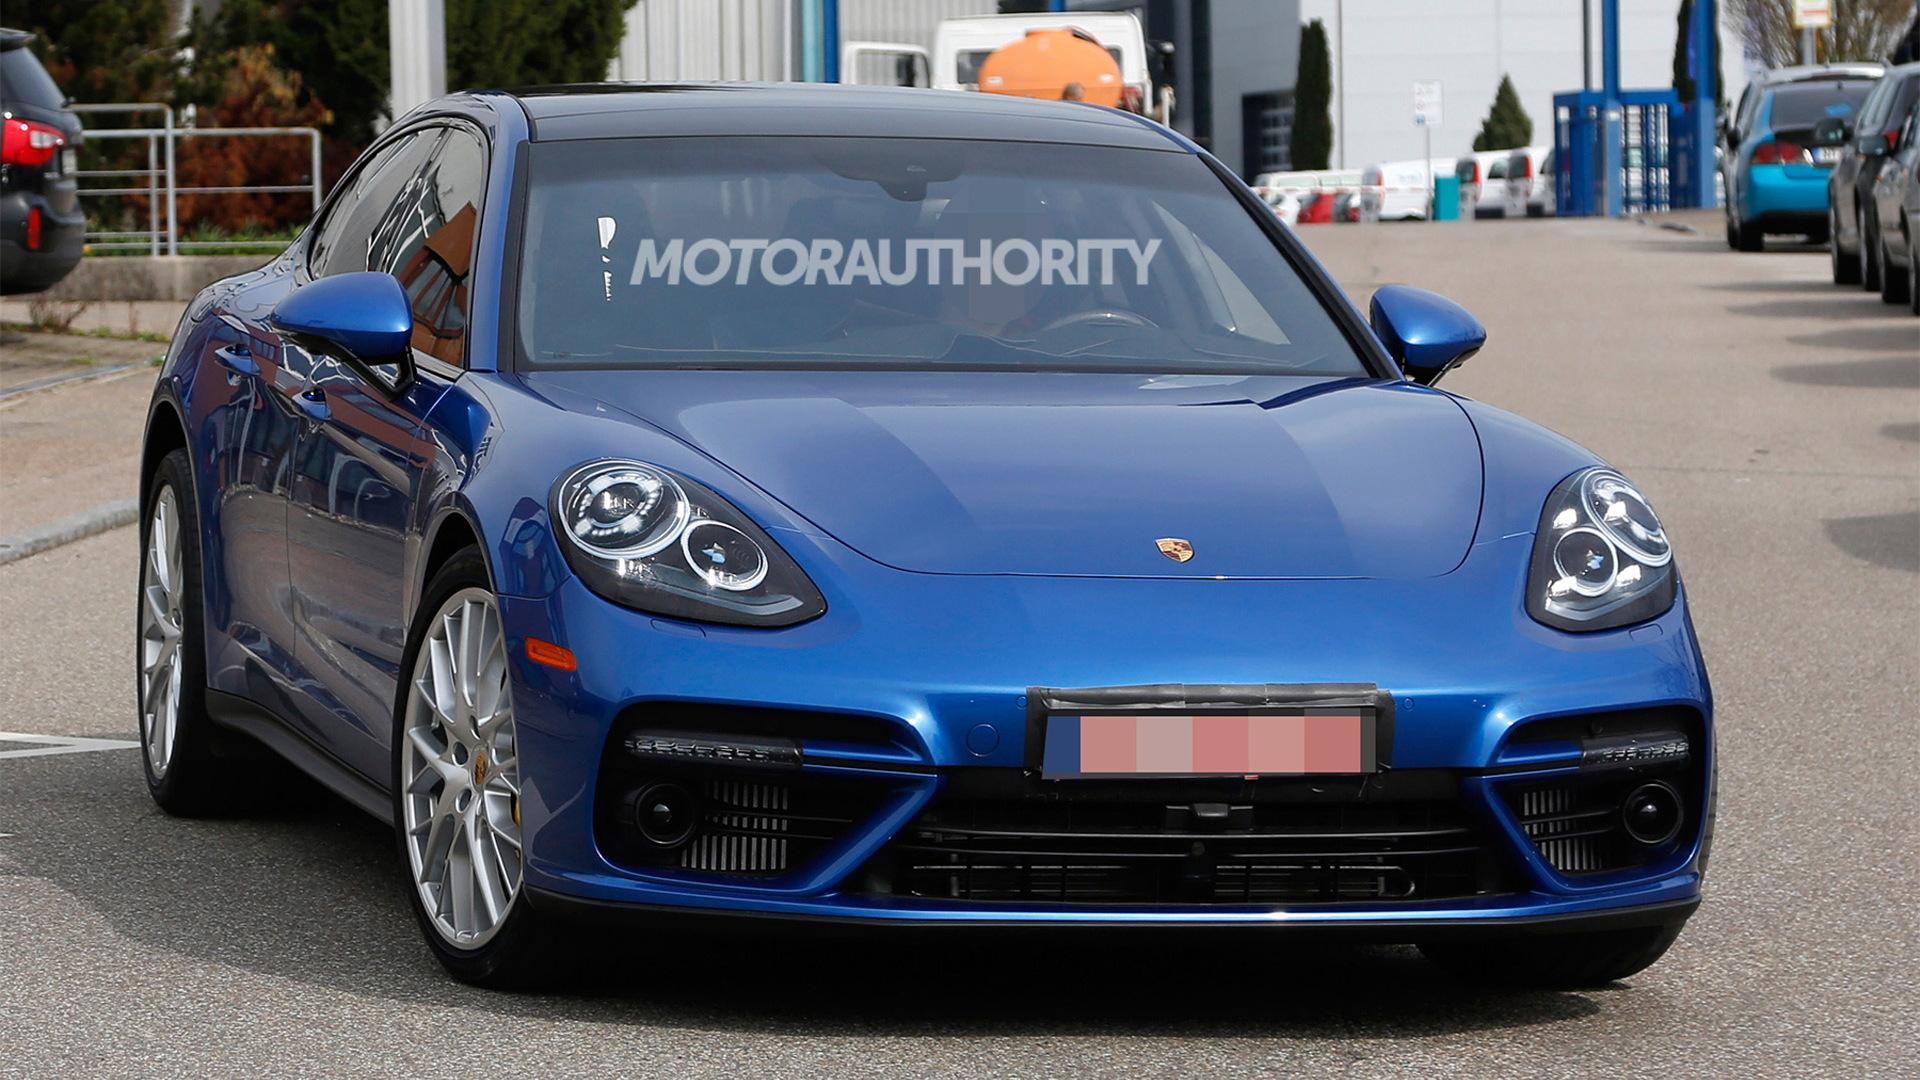 2017 Porsche Panamera spy shots - Image via S. Baldauf/SB-Medien